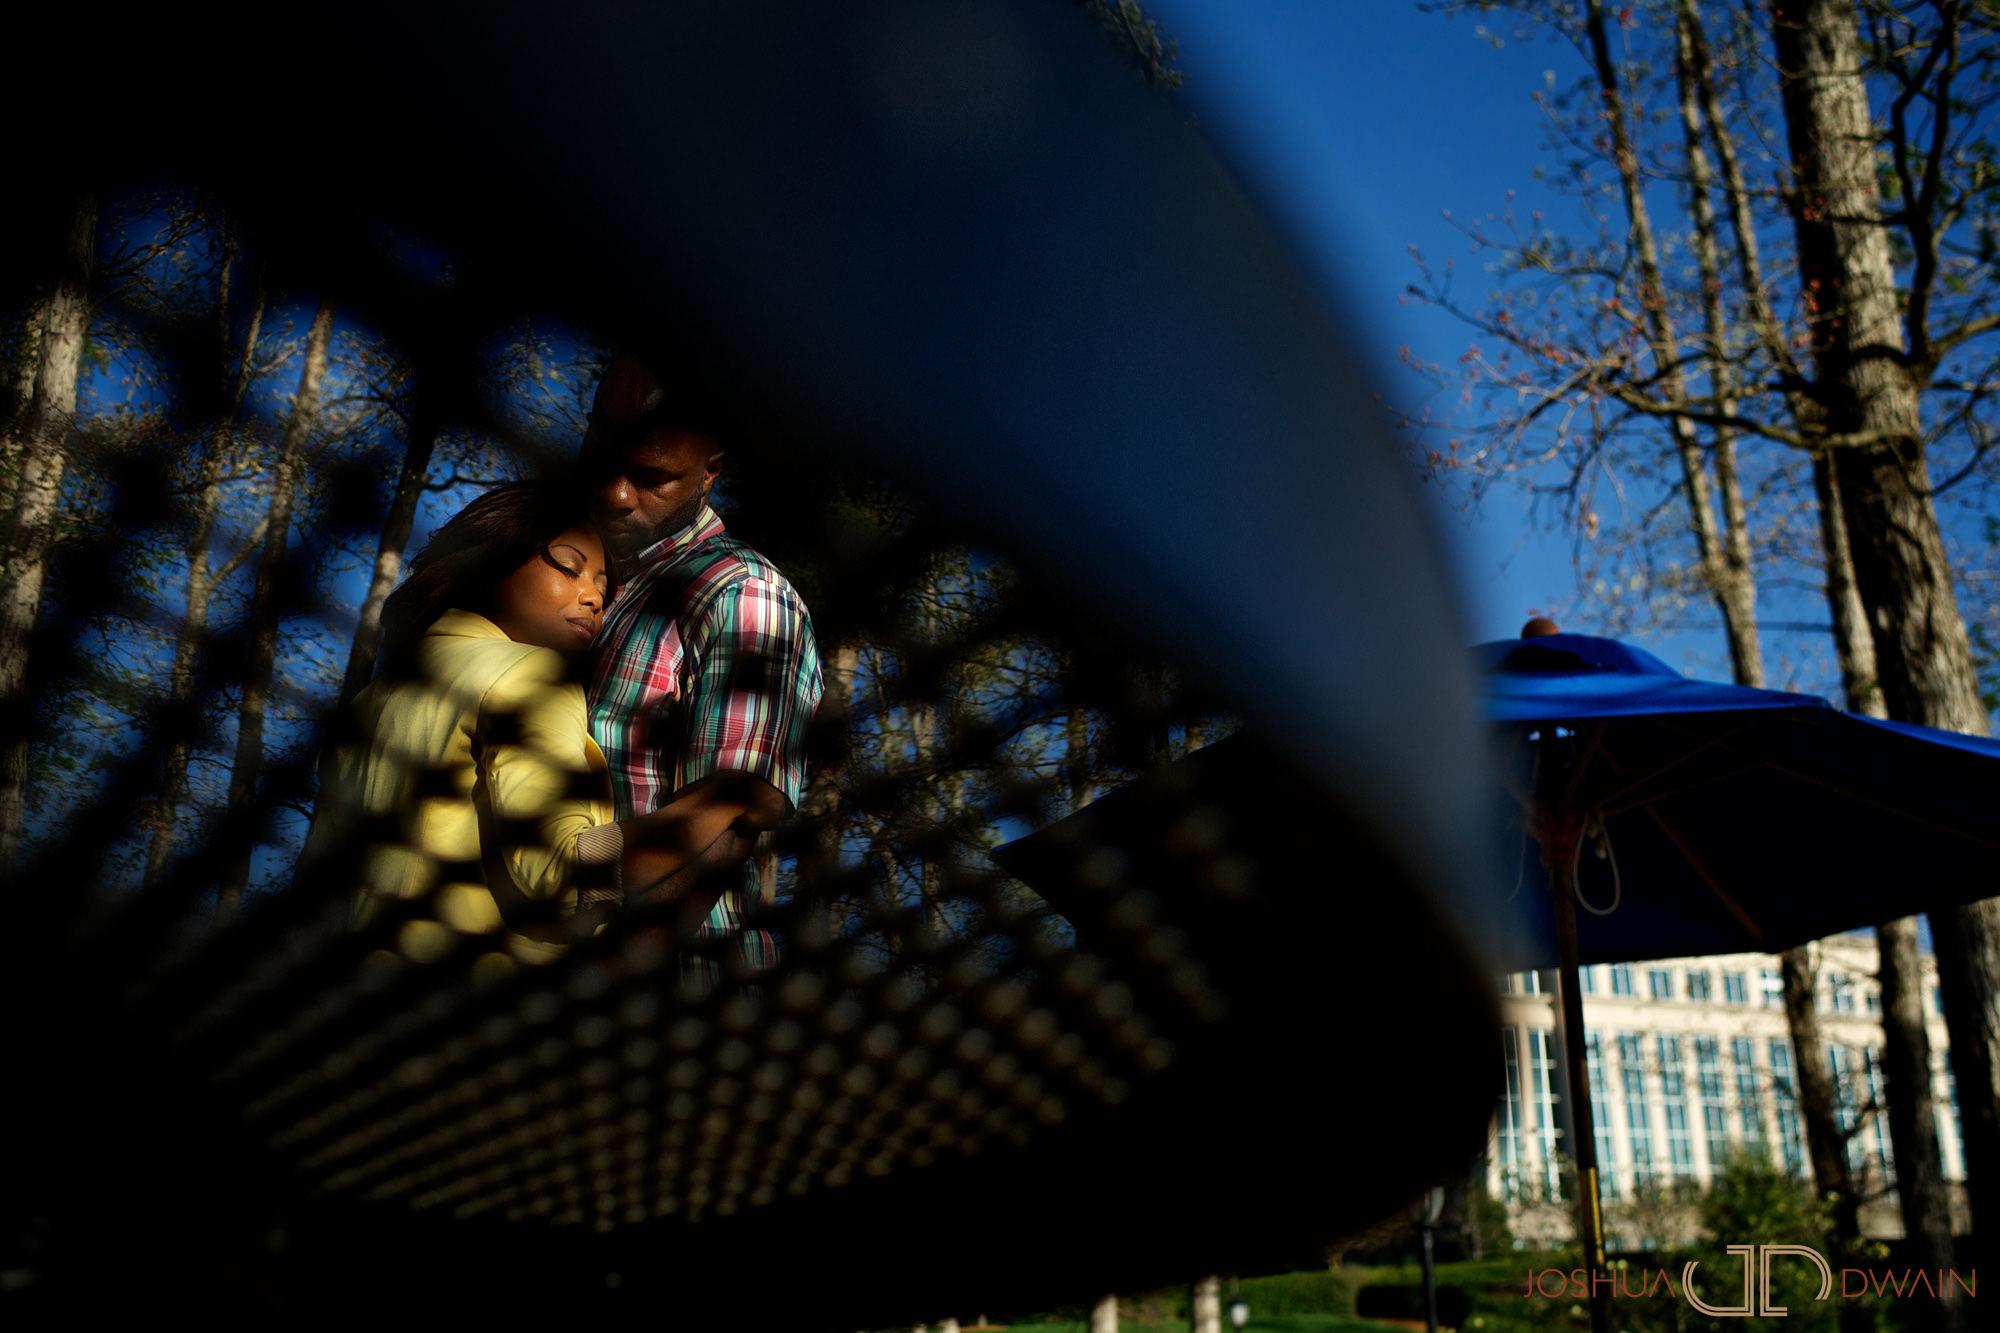 nia-jeff-006-downtown-charlotte-nc-engagement-photographer-joshua-dwain-2013-04-12_NJ_032